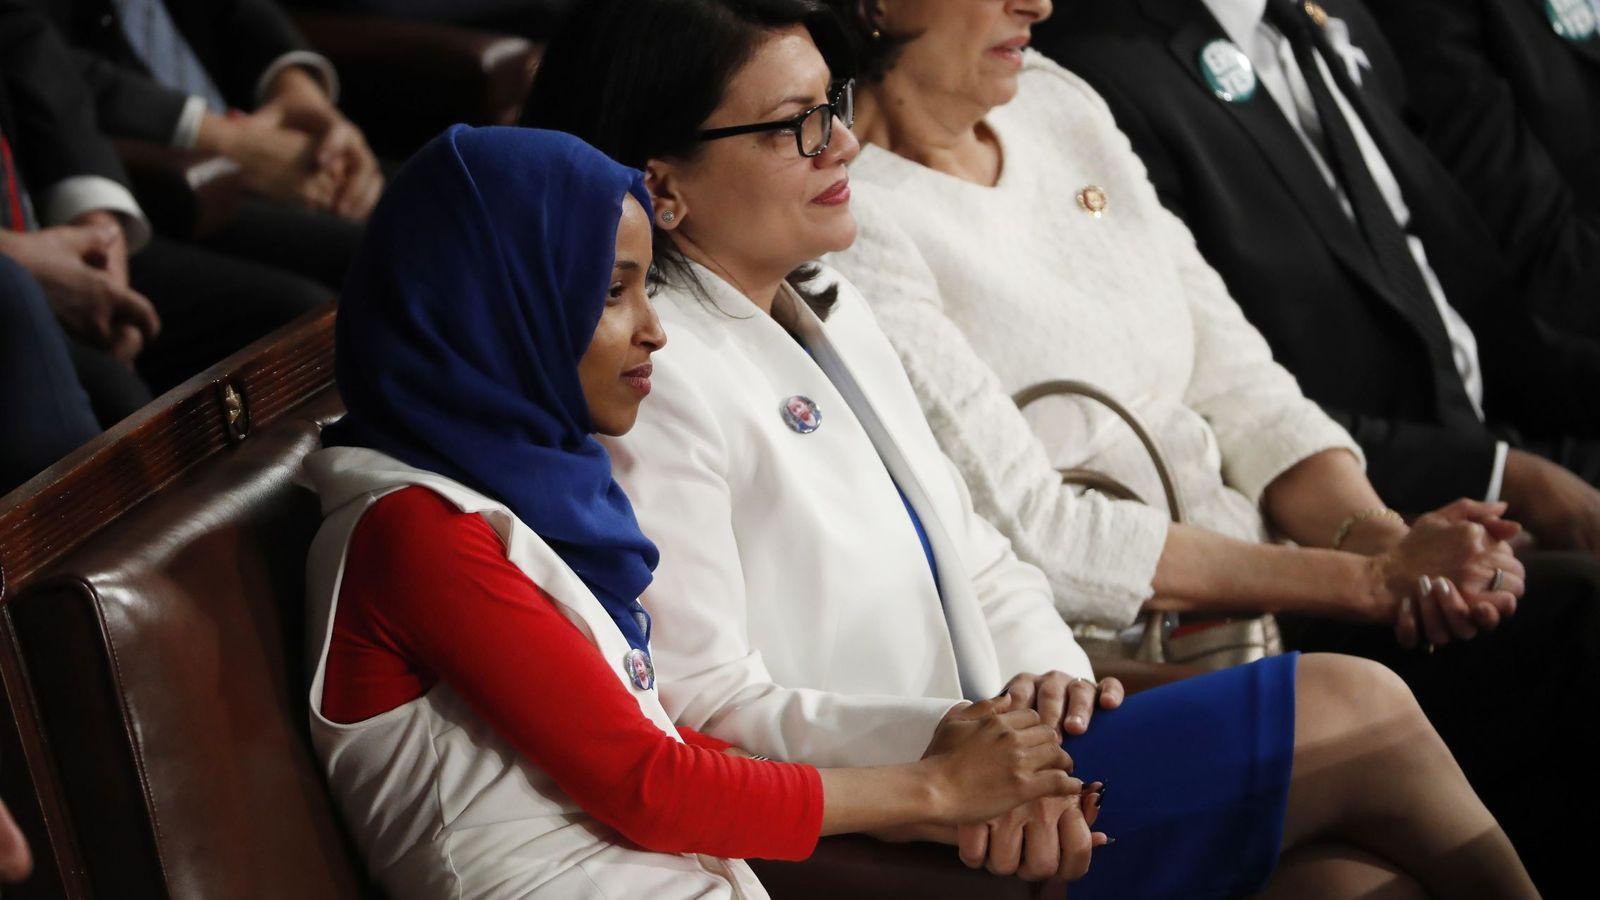 Foto: Las representantes demócratas Ilhan Omar (i), de Minnesota, y Rashida Tlaib (c) de Michigan. (EFE)